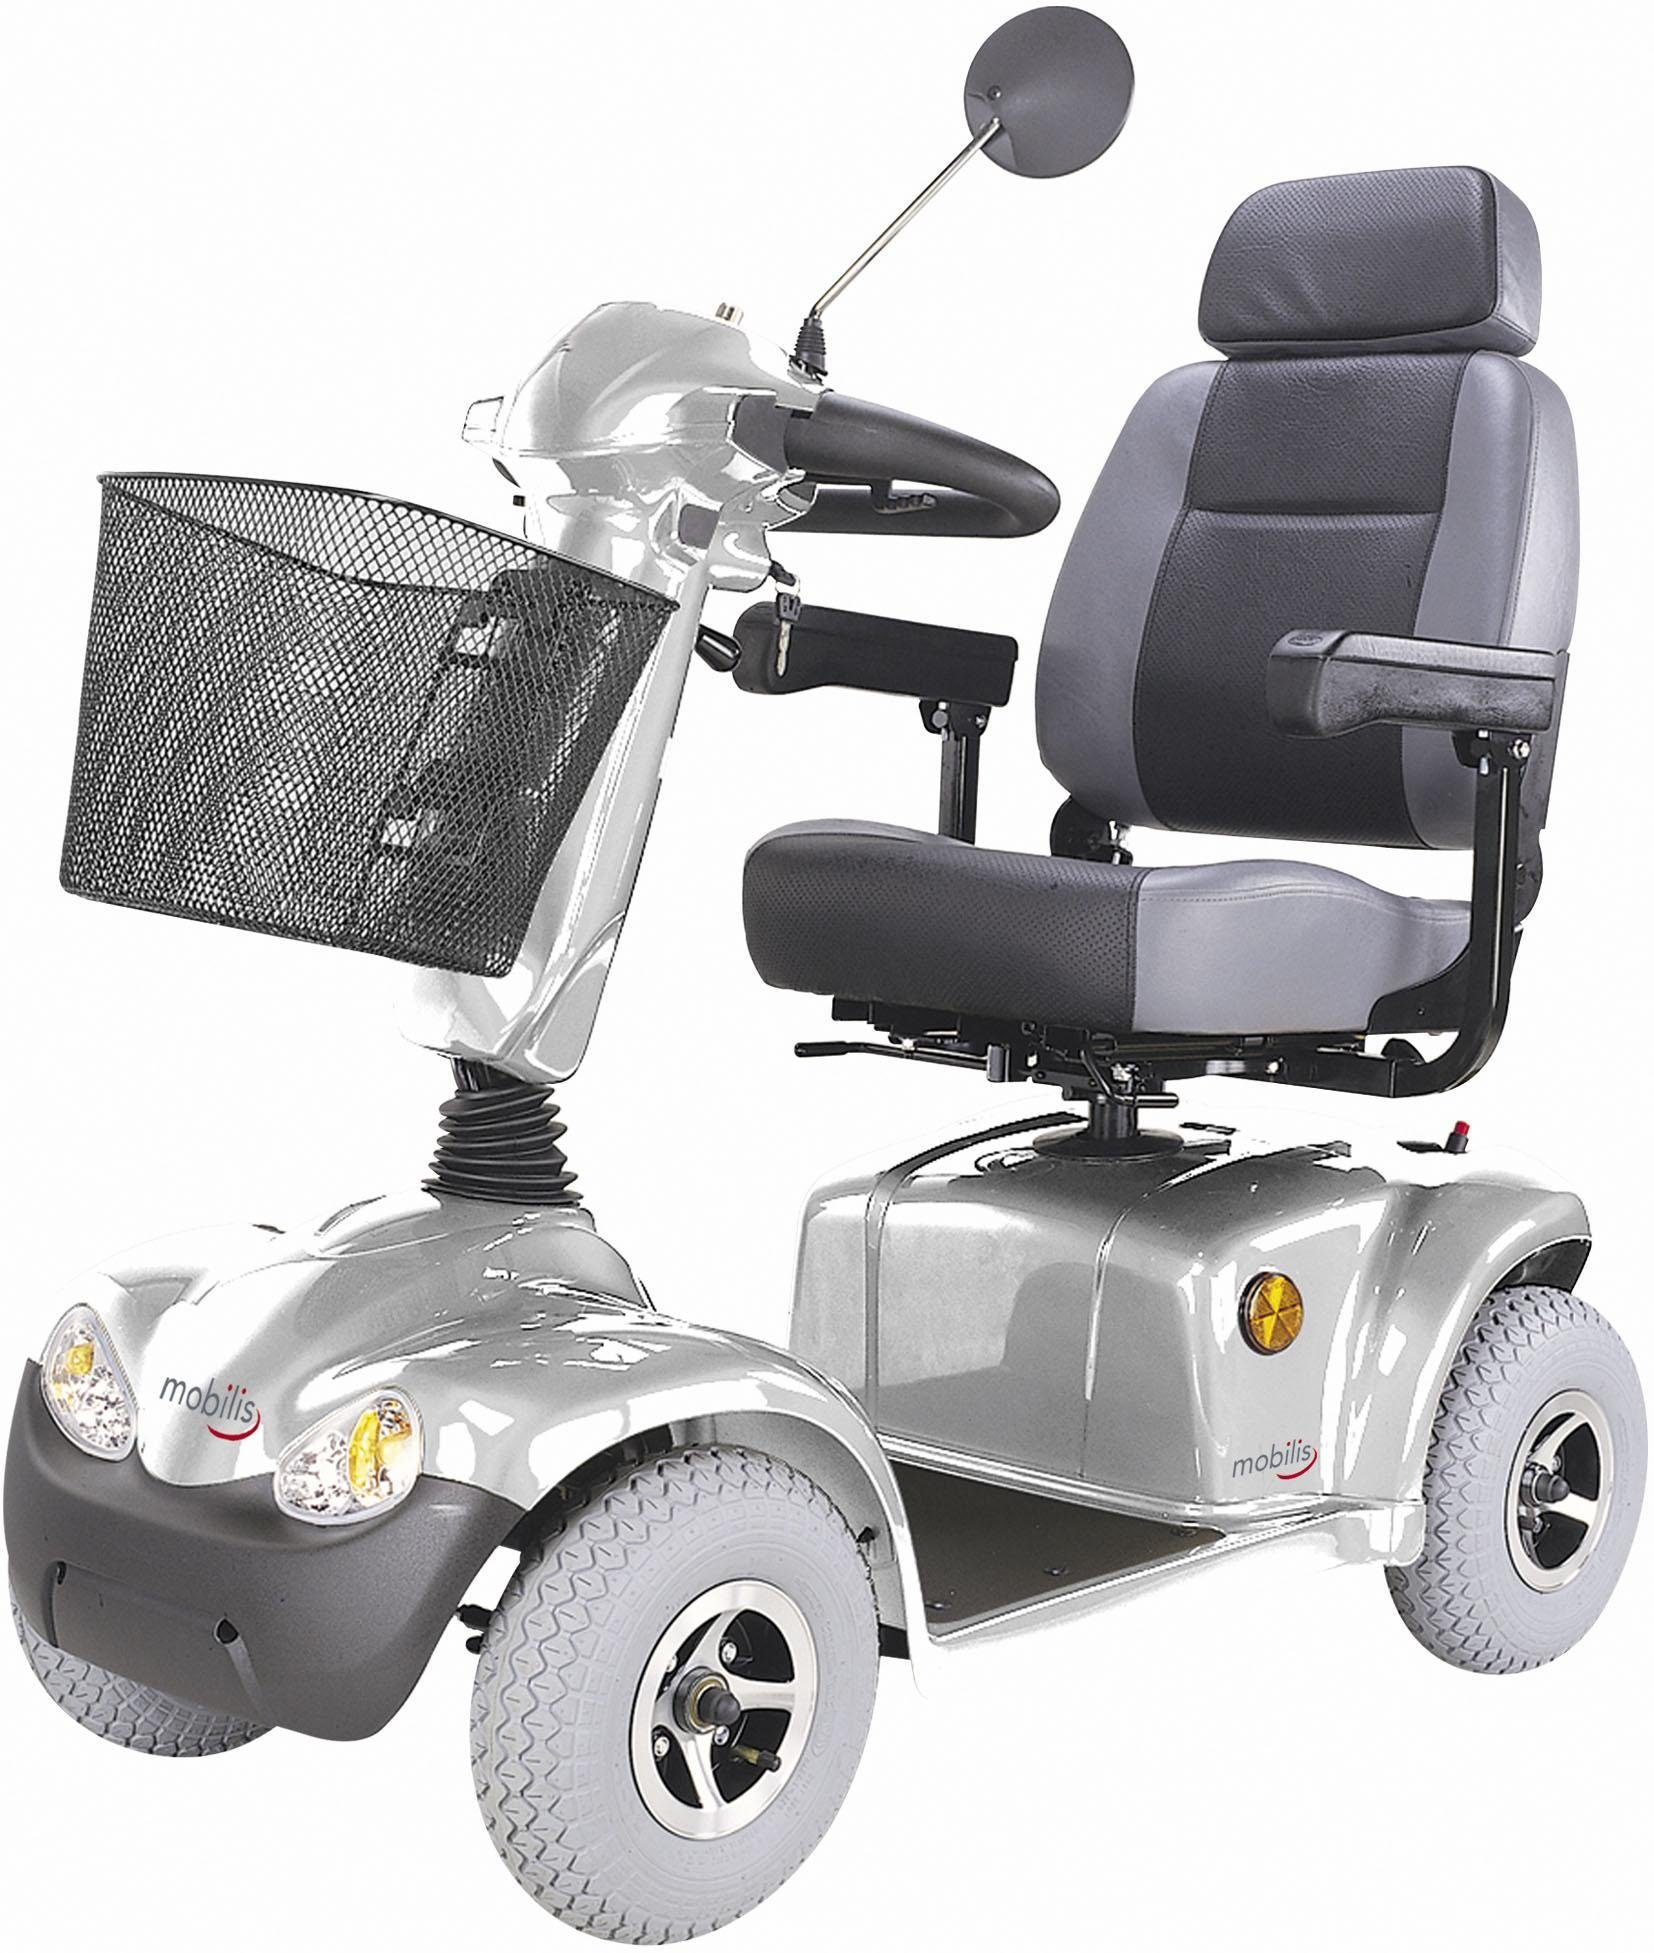 Mobilis Elektromobil, Scooter M68, 12 km/h, wird direkt an den Kunden inklusive Einweisung geliefert